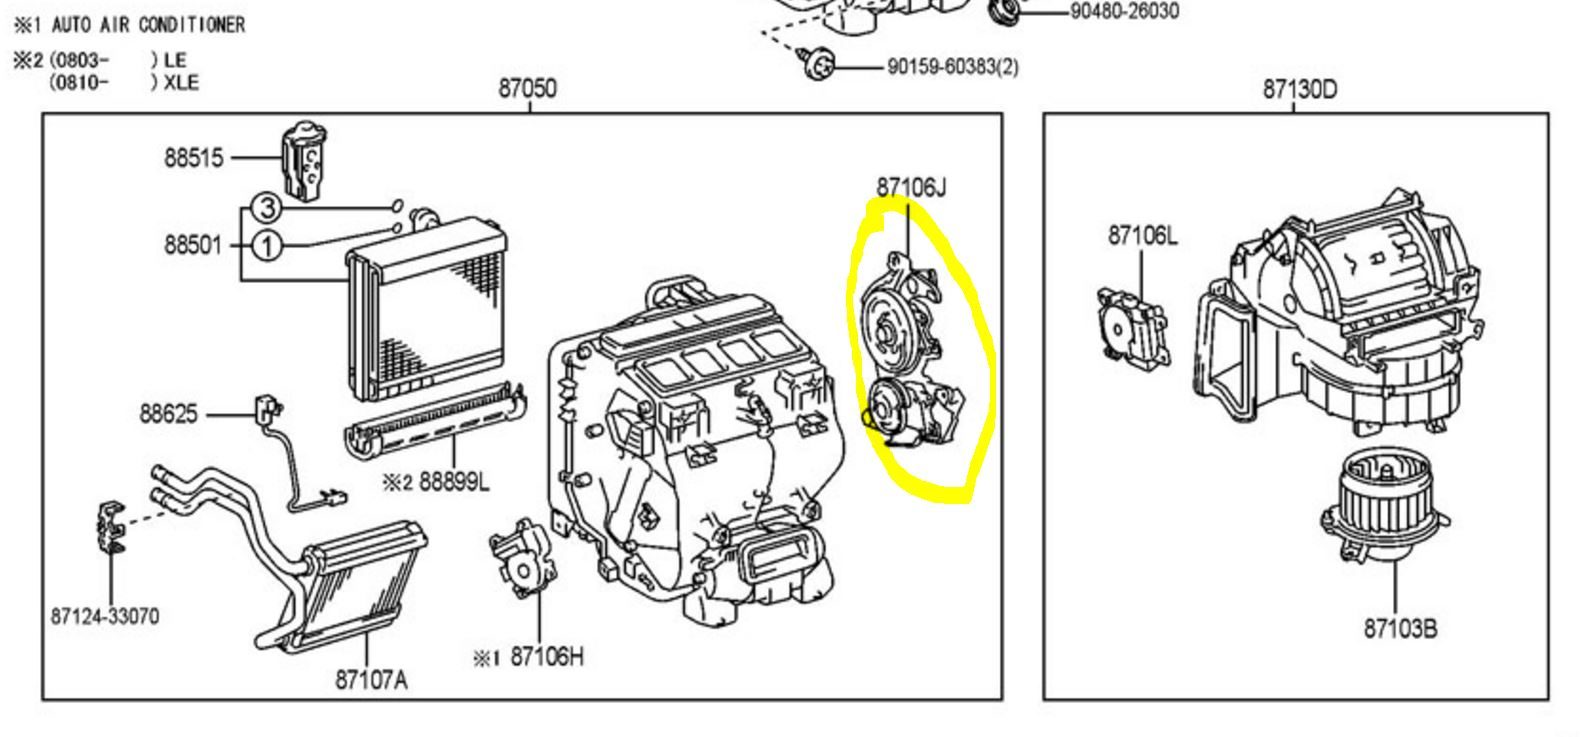 hight resolution of center heater ac vents no flow 08cam jpg